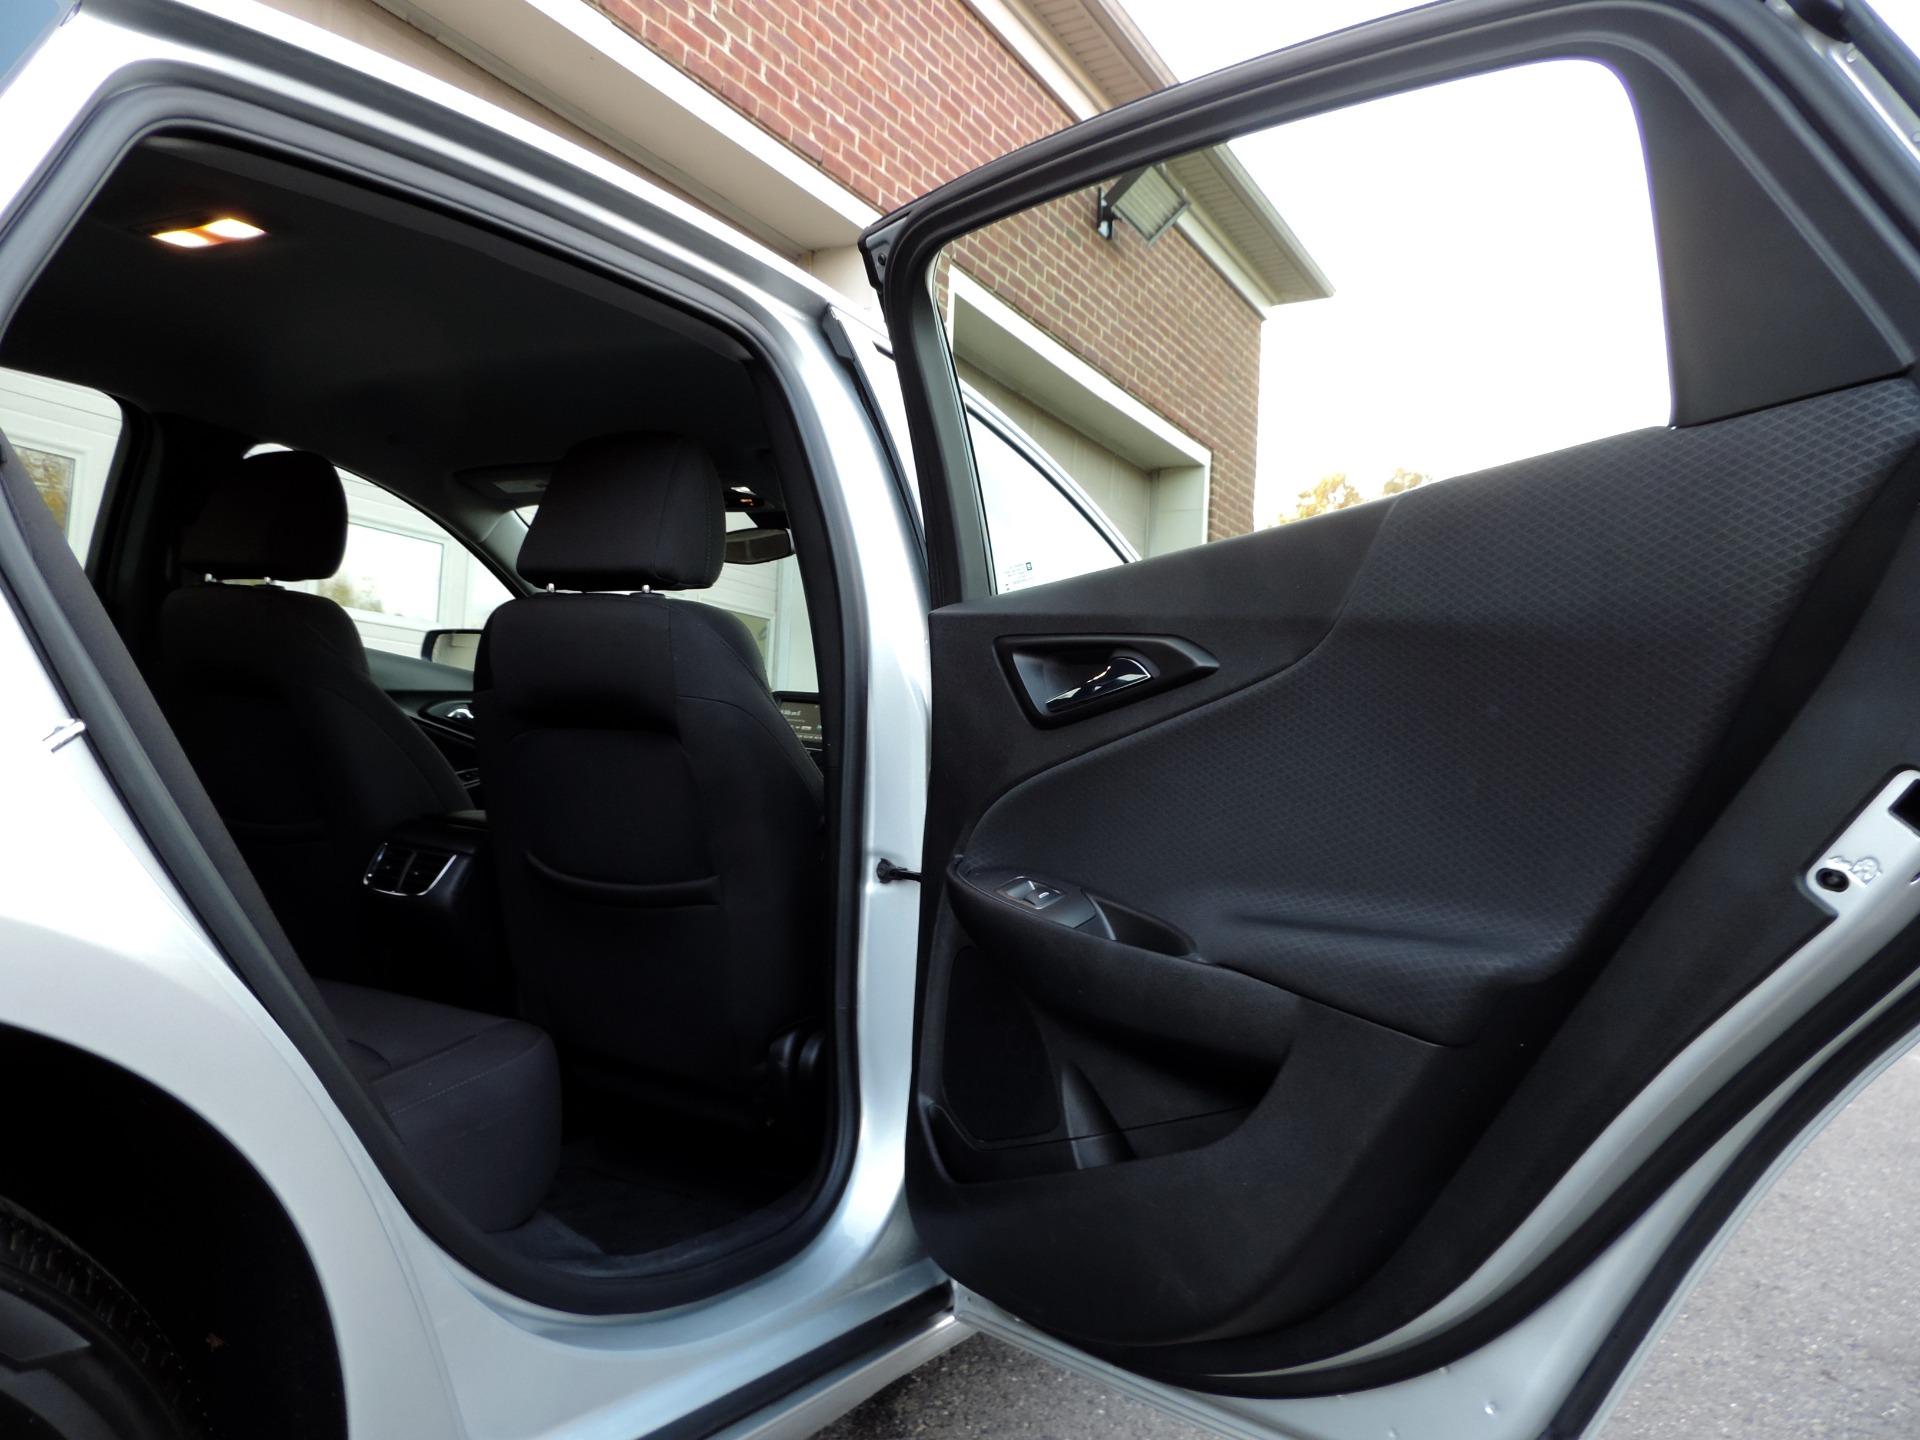 Used-2018-Chevrolet-Malibu-LT